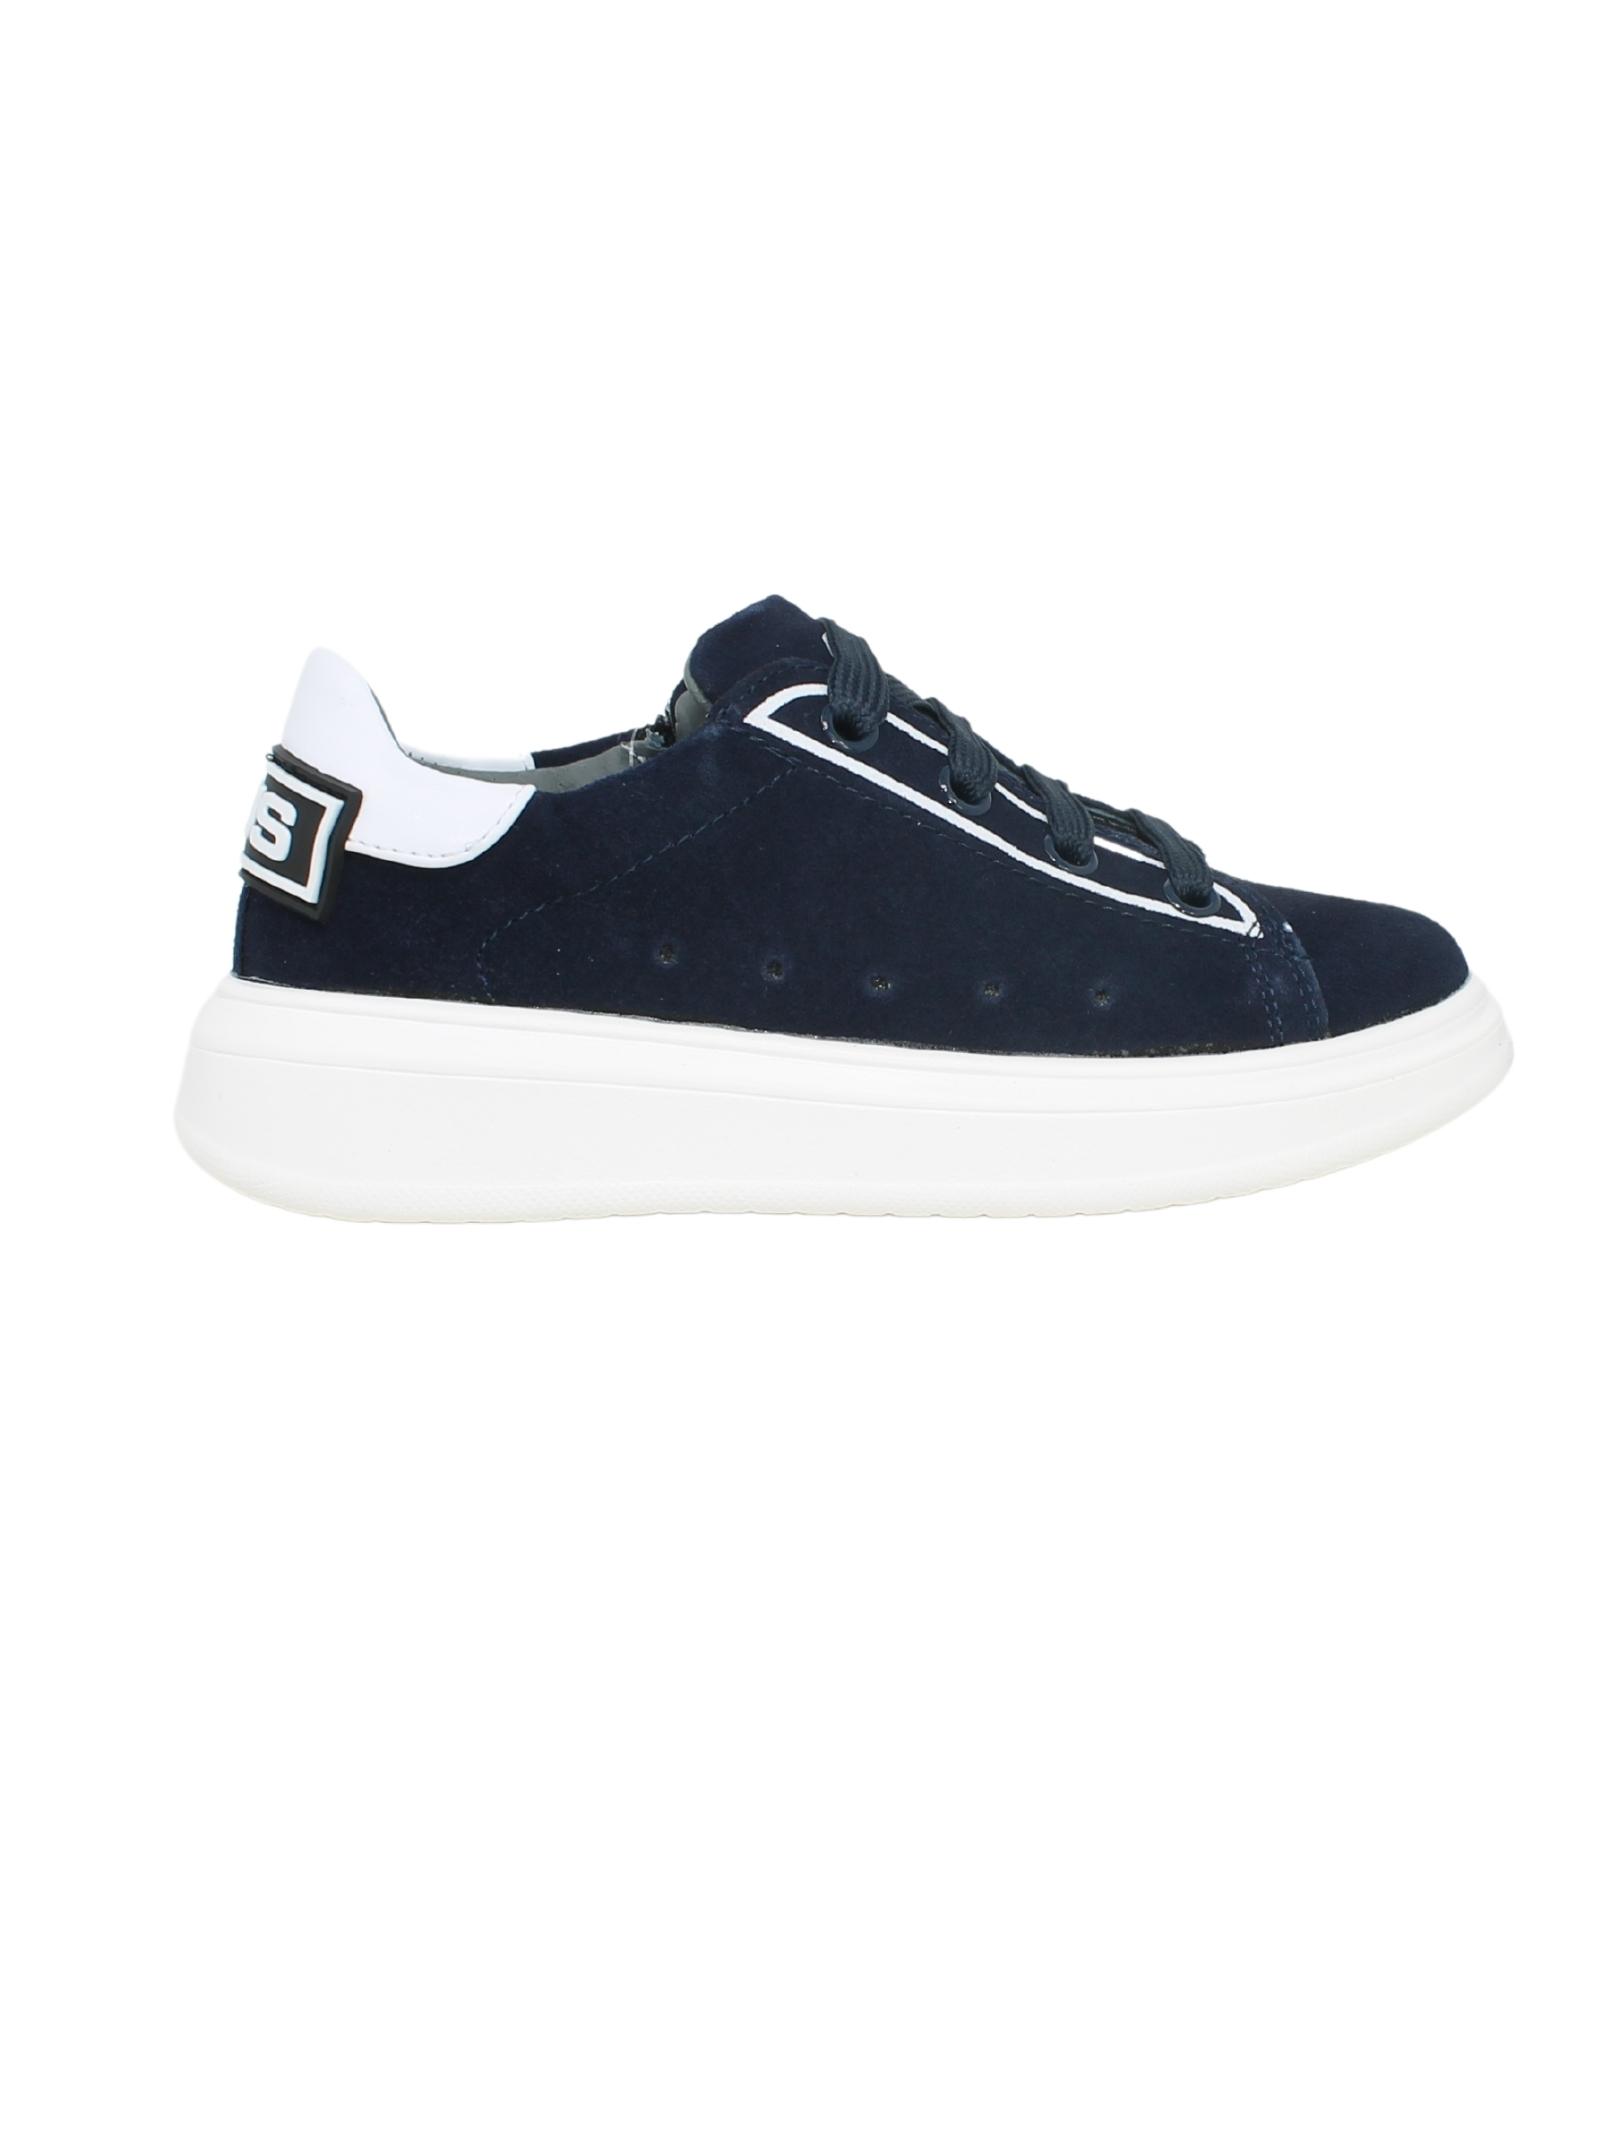 Baby Blue Low Sneakers CESARE PACIOTTI | Sneakers | 4U002BLU